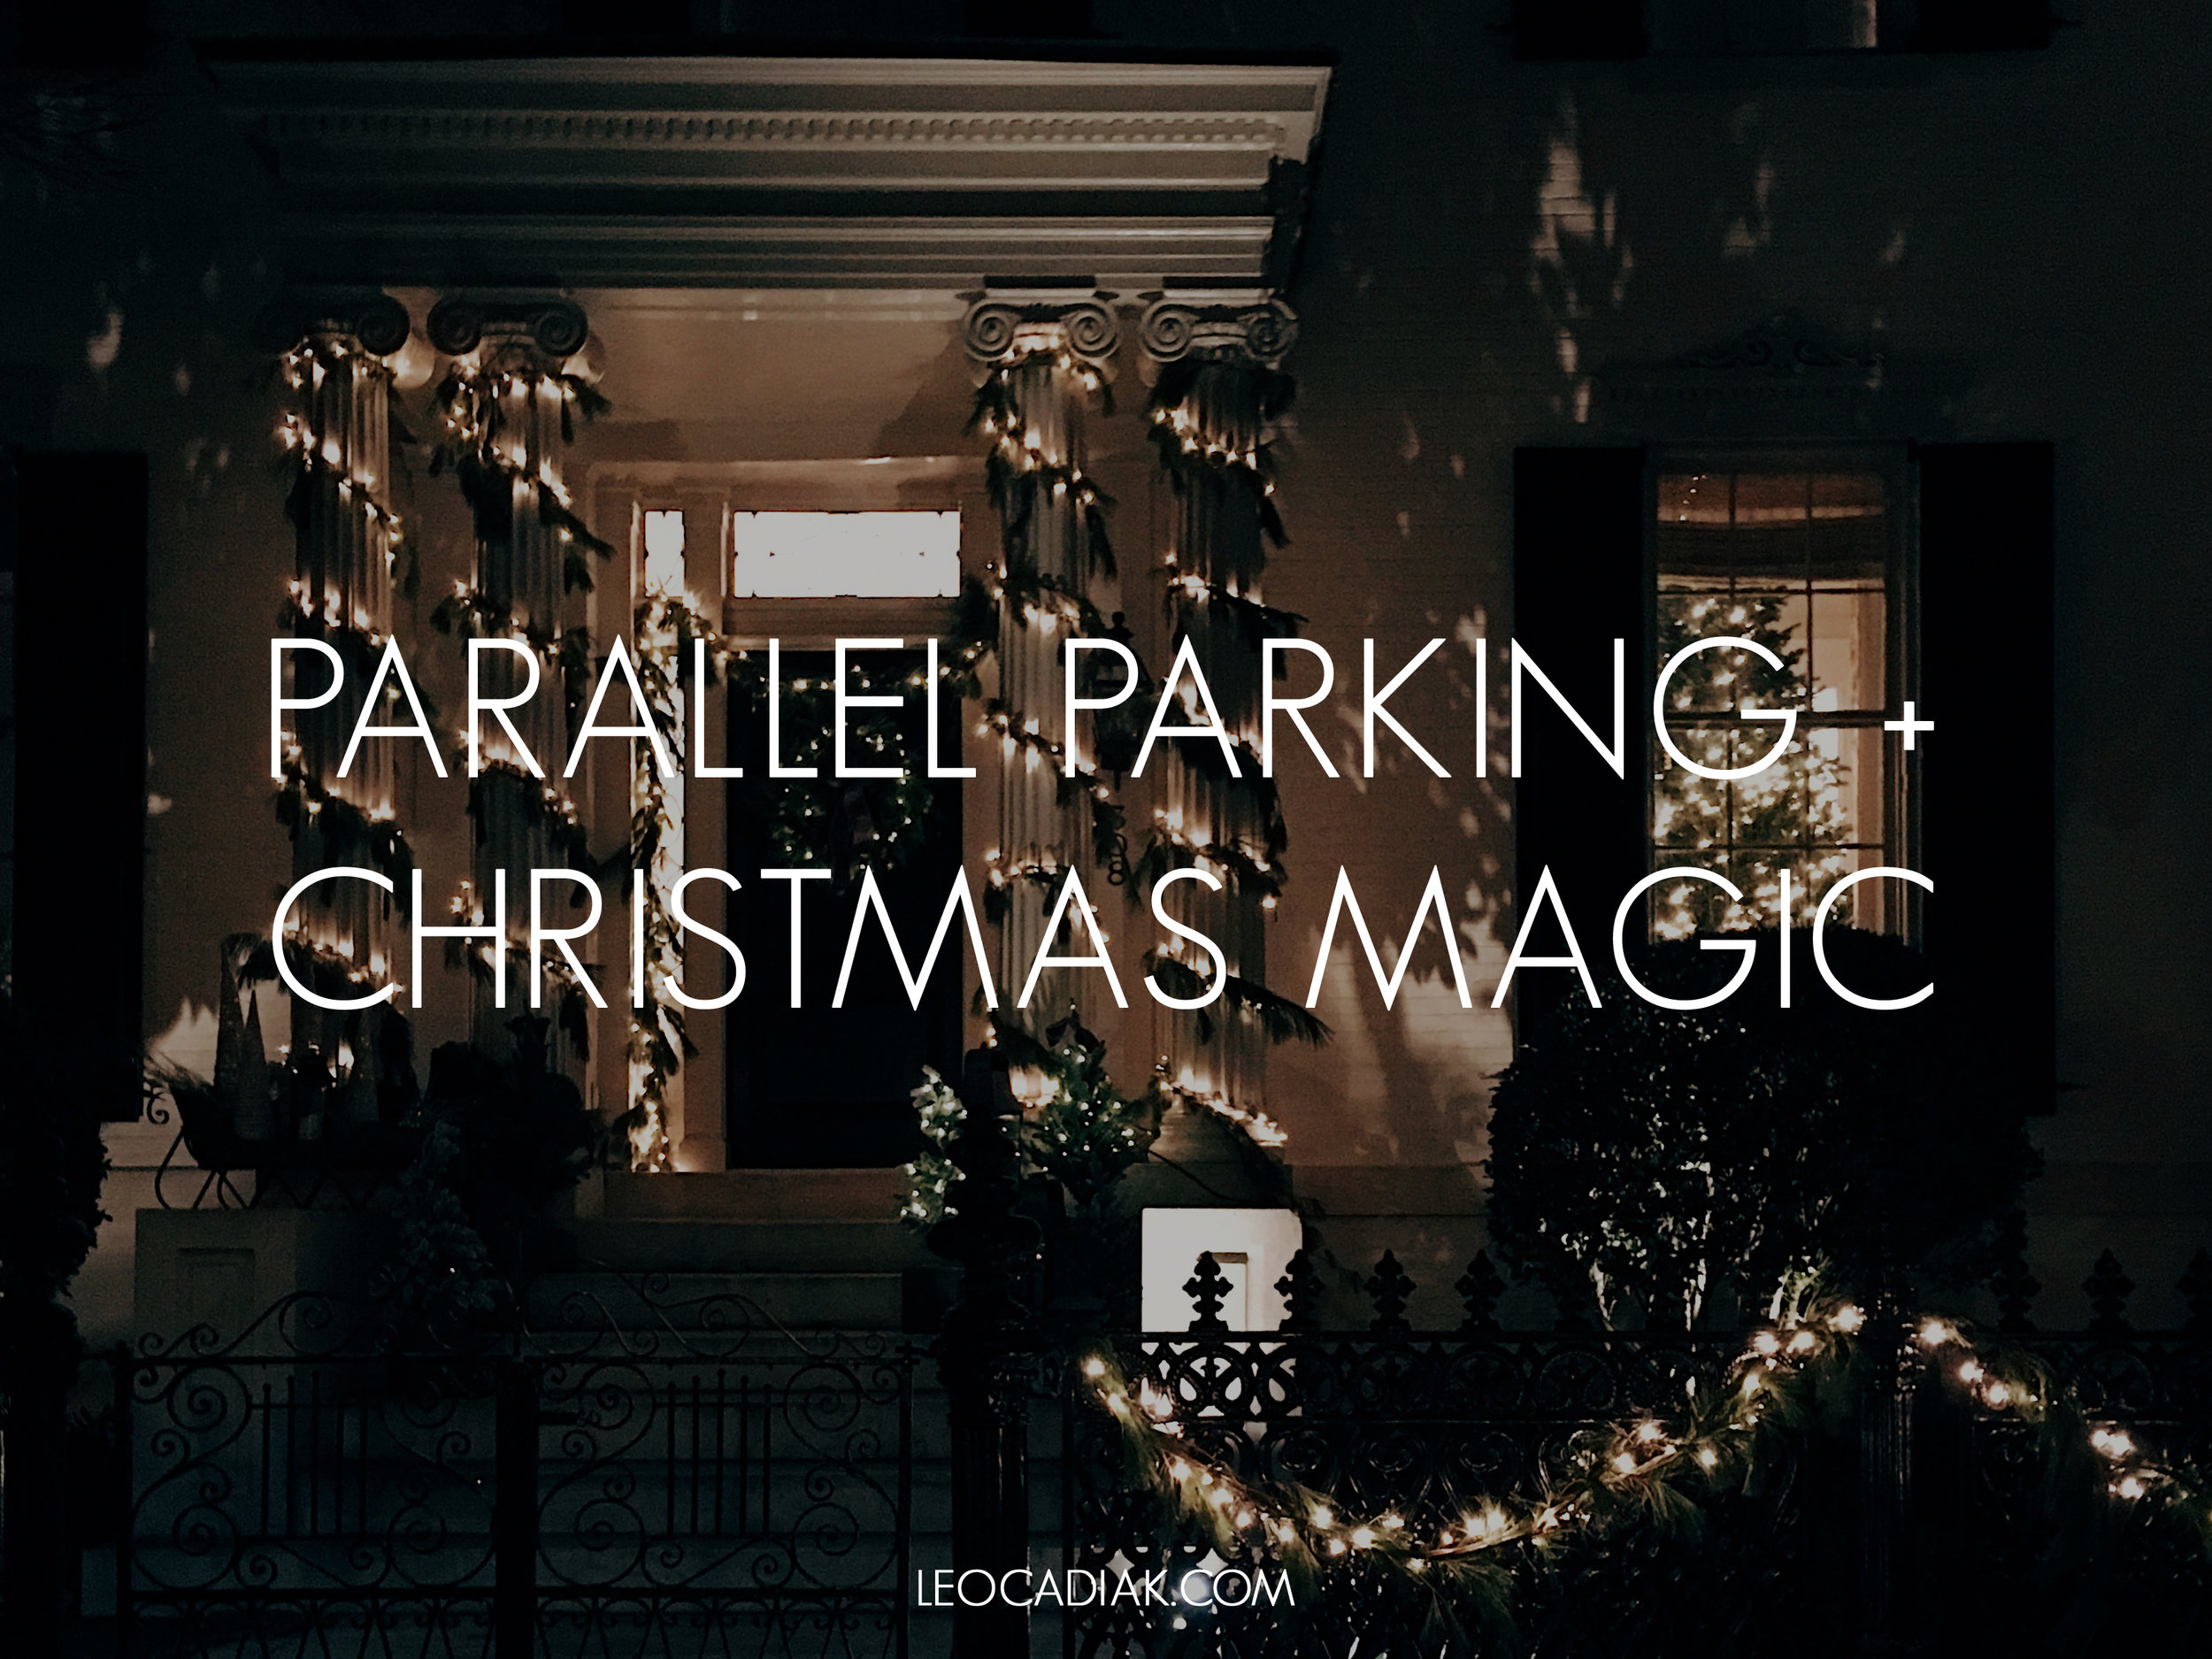 LK_ParallelParking+XmasMagic.jpg